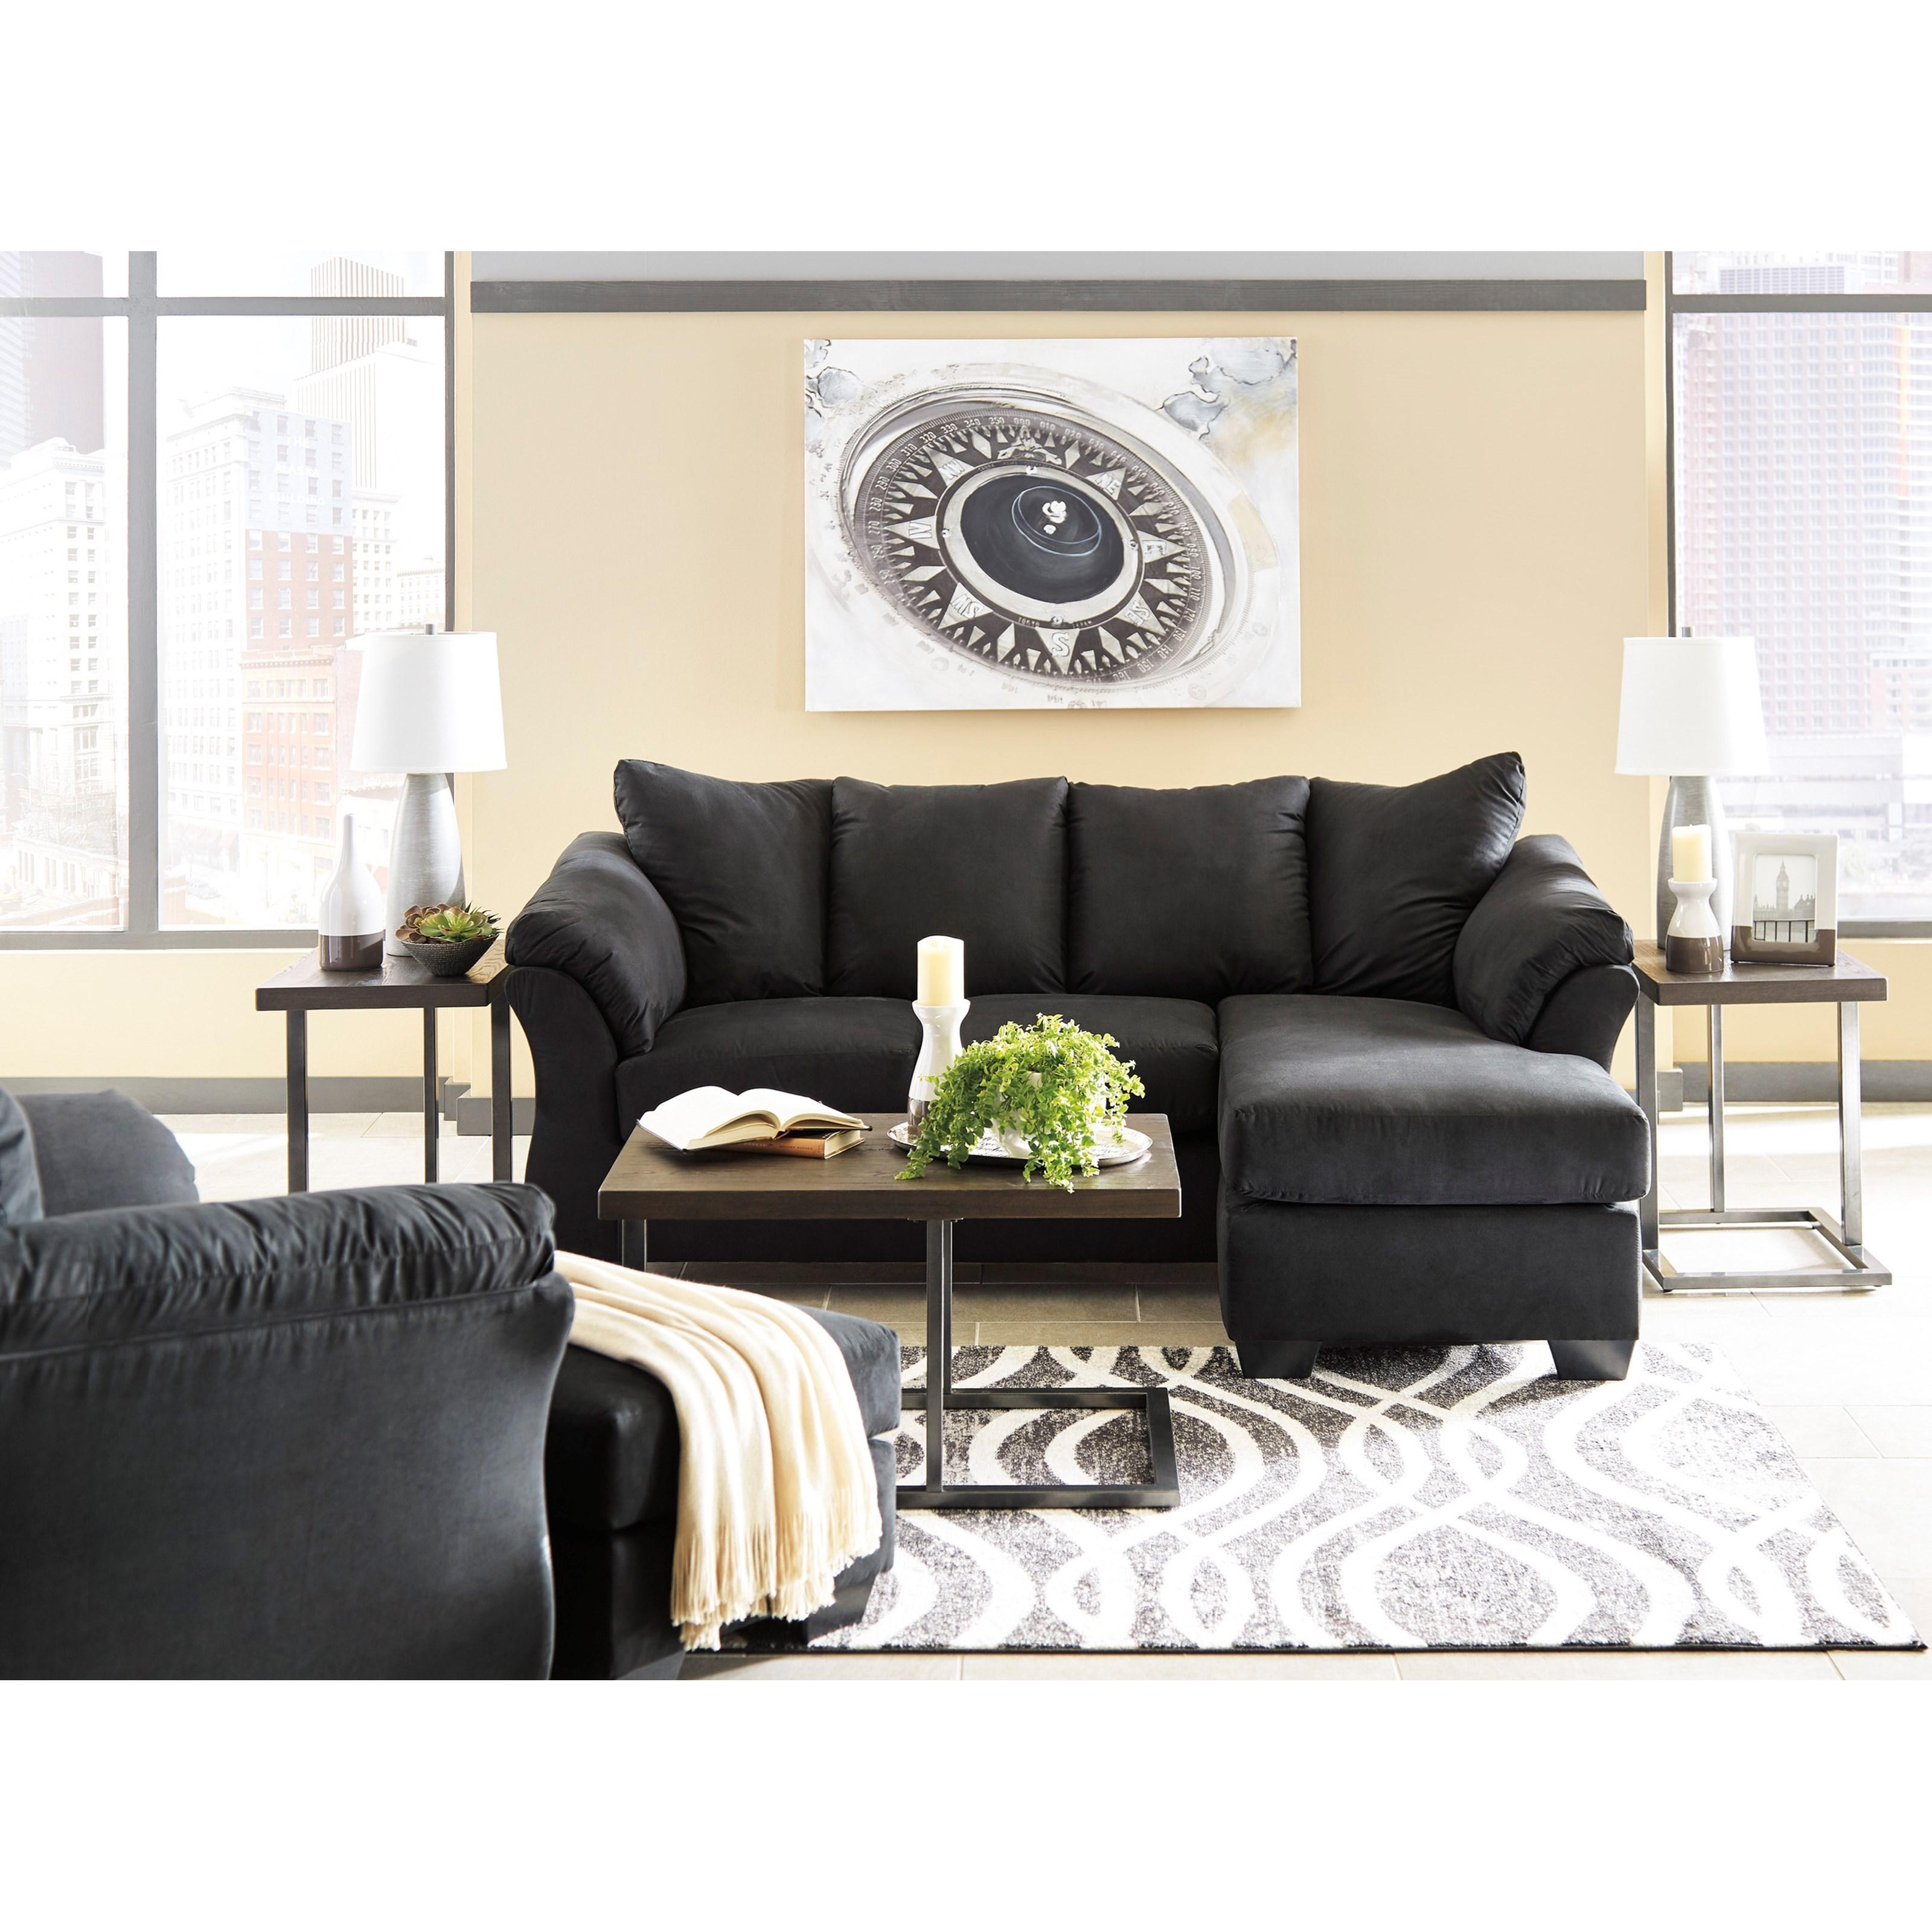 Ashley signature design darcy black contemporary sofa for Ashley furniture lucia sofa chaise